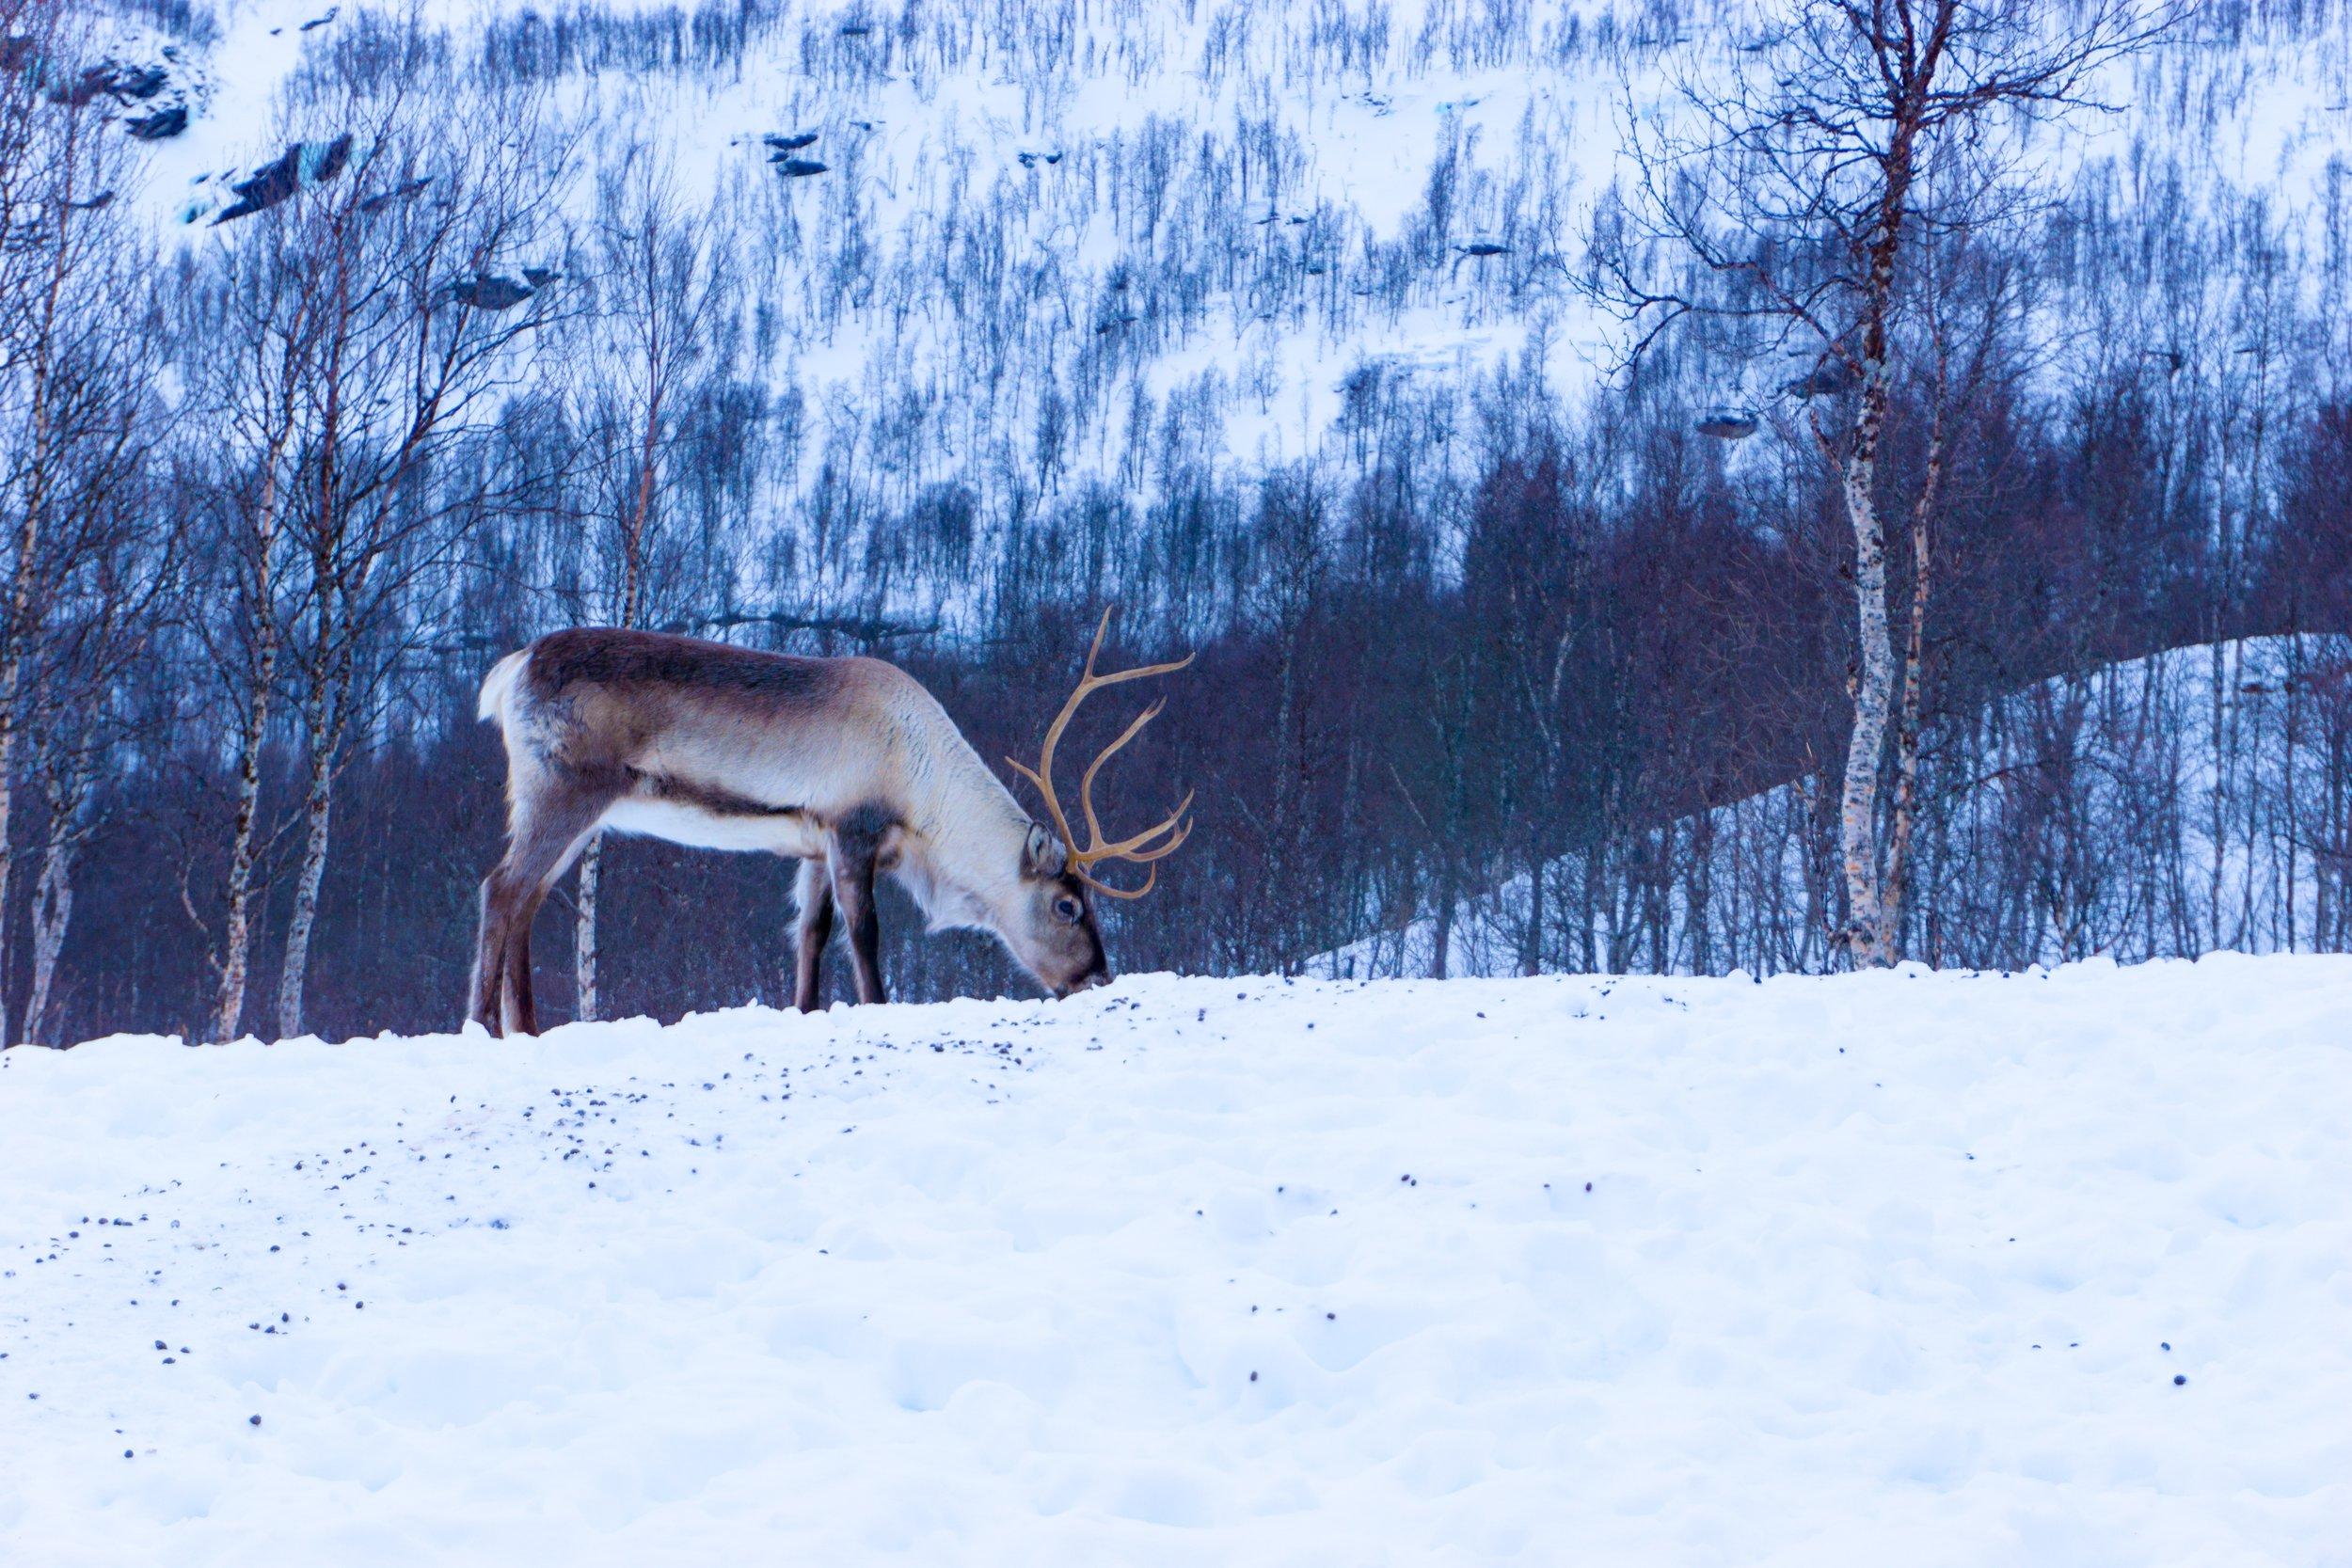 warren-sammut-caribou artic preserve Up cW.jpg